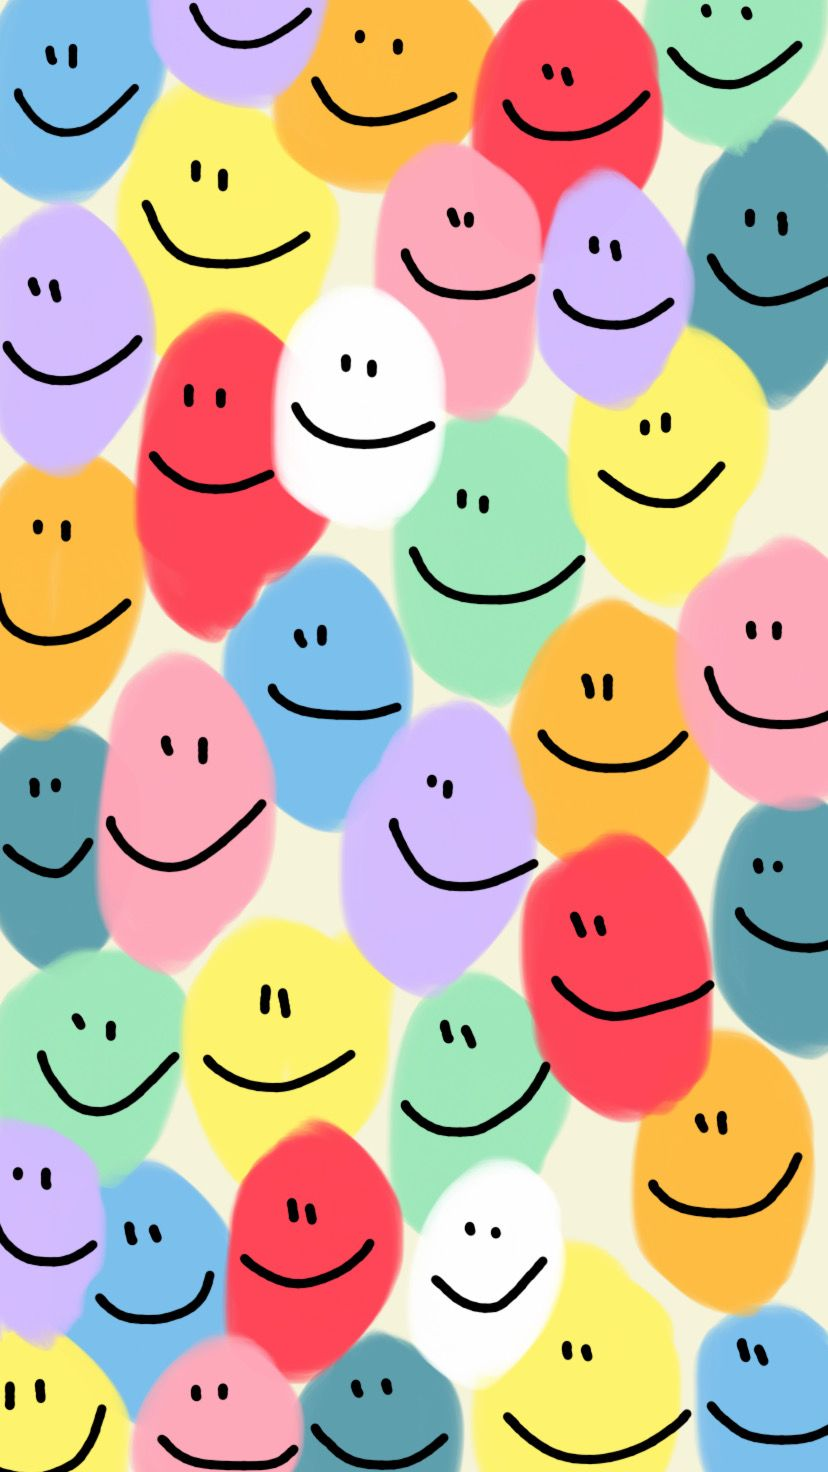 Smiley Face Wallpaper Cute Patterns Wallpaper Art Collage Wall Trippy Wallpaper